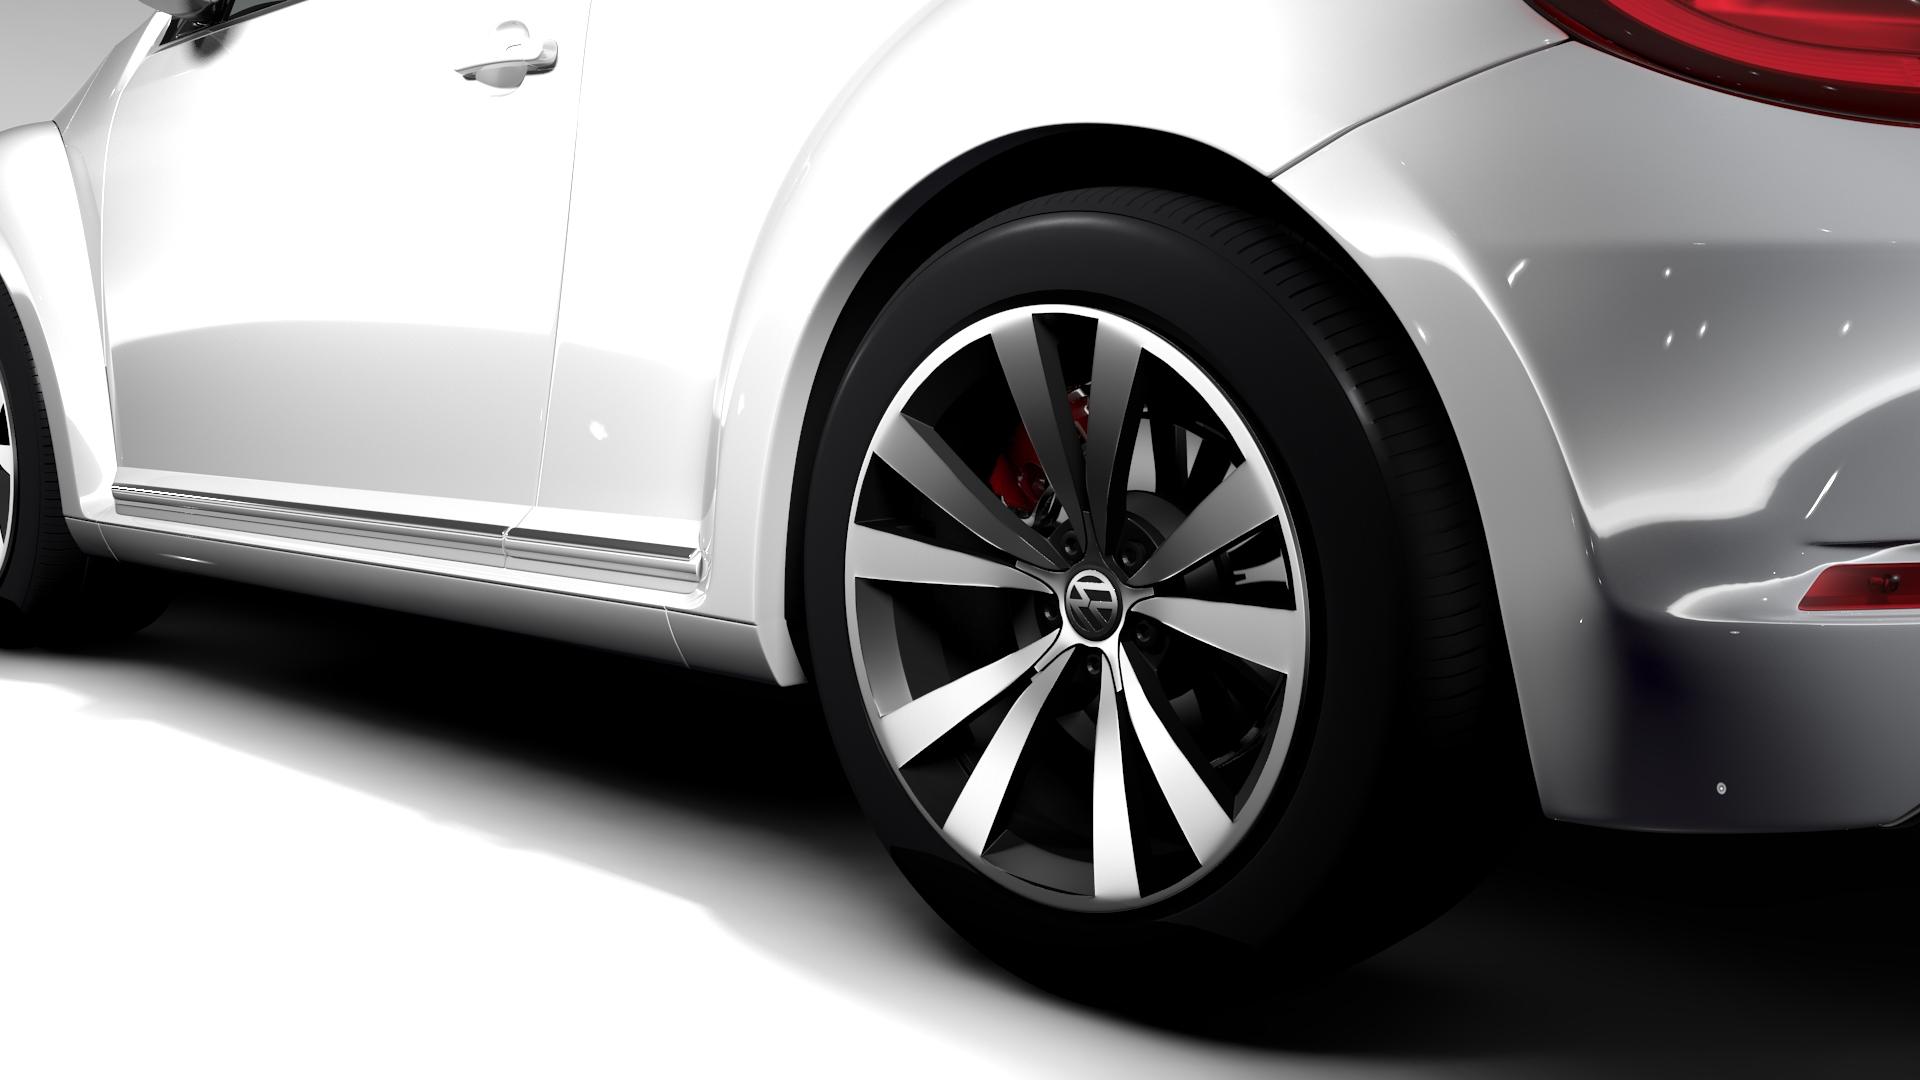 vw beetle cabriolet 2017 3d model 3ds max fbx c4d lwo ma mb hrc xsi obj 221595